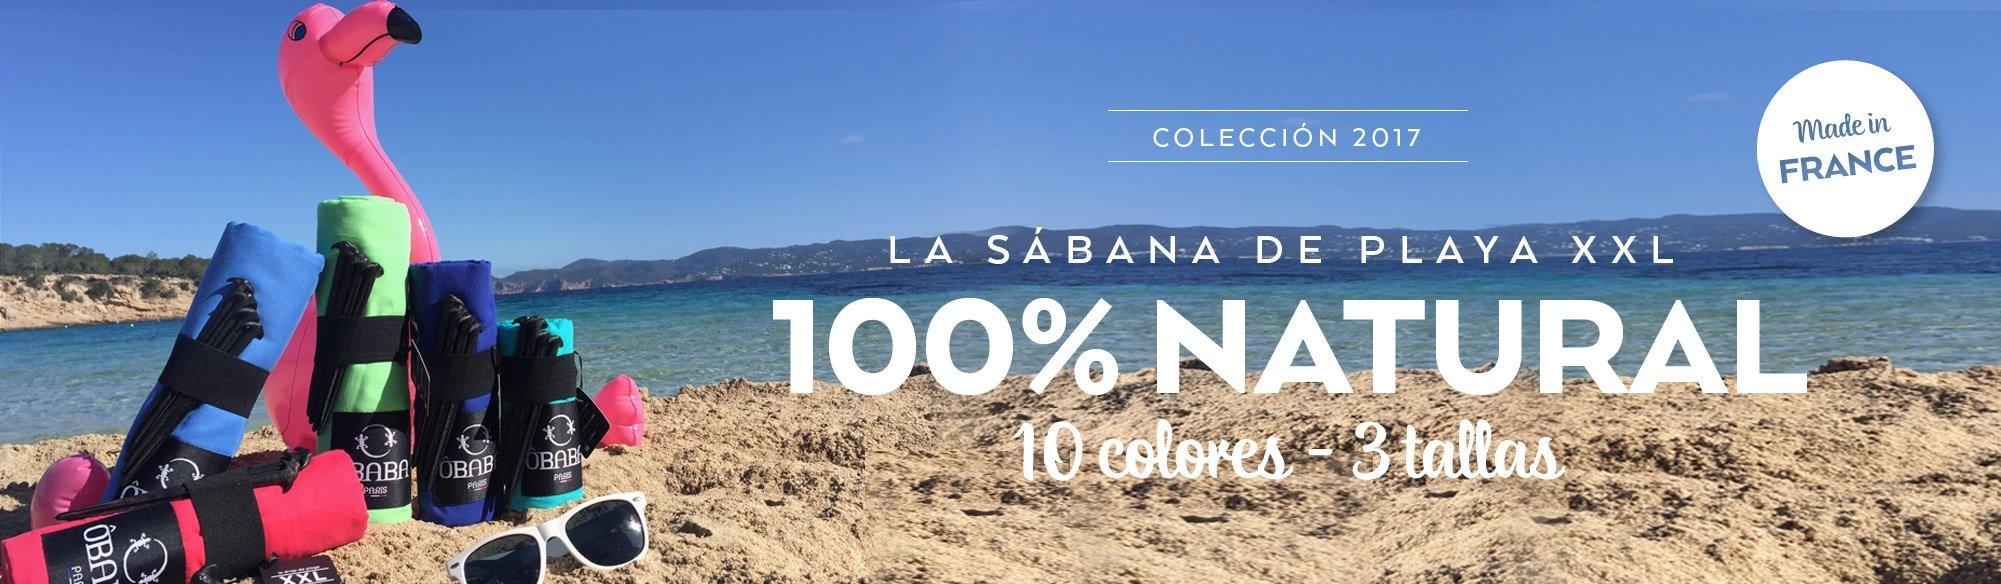 La sabana de playa 100% natural